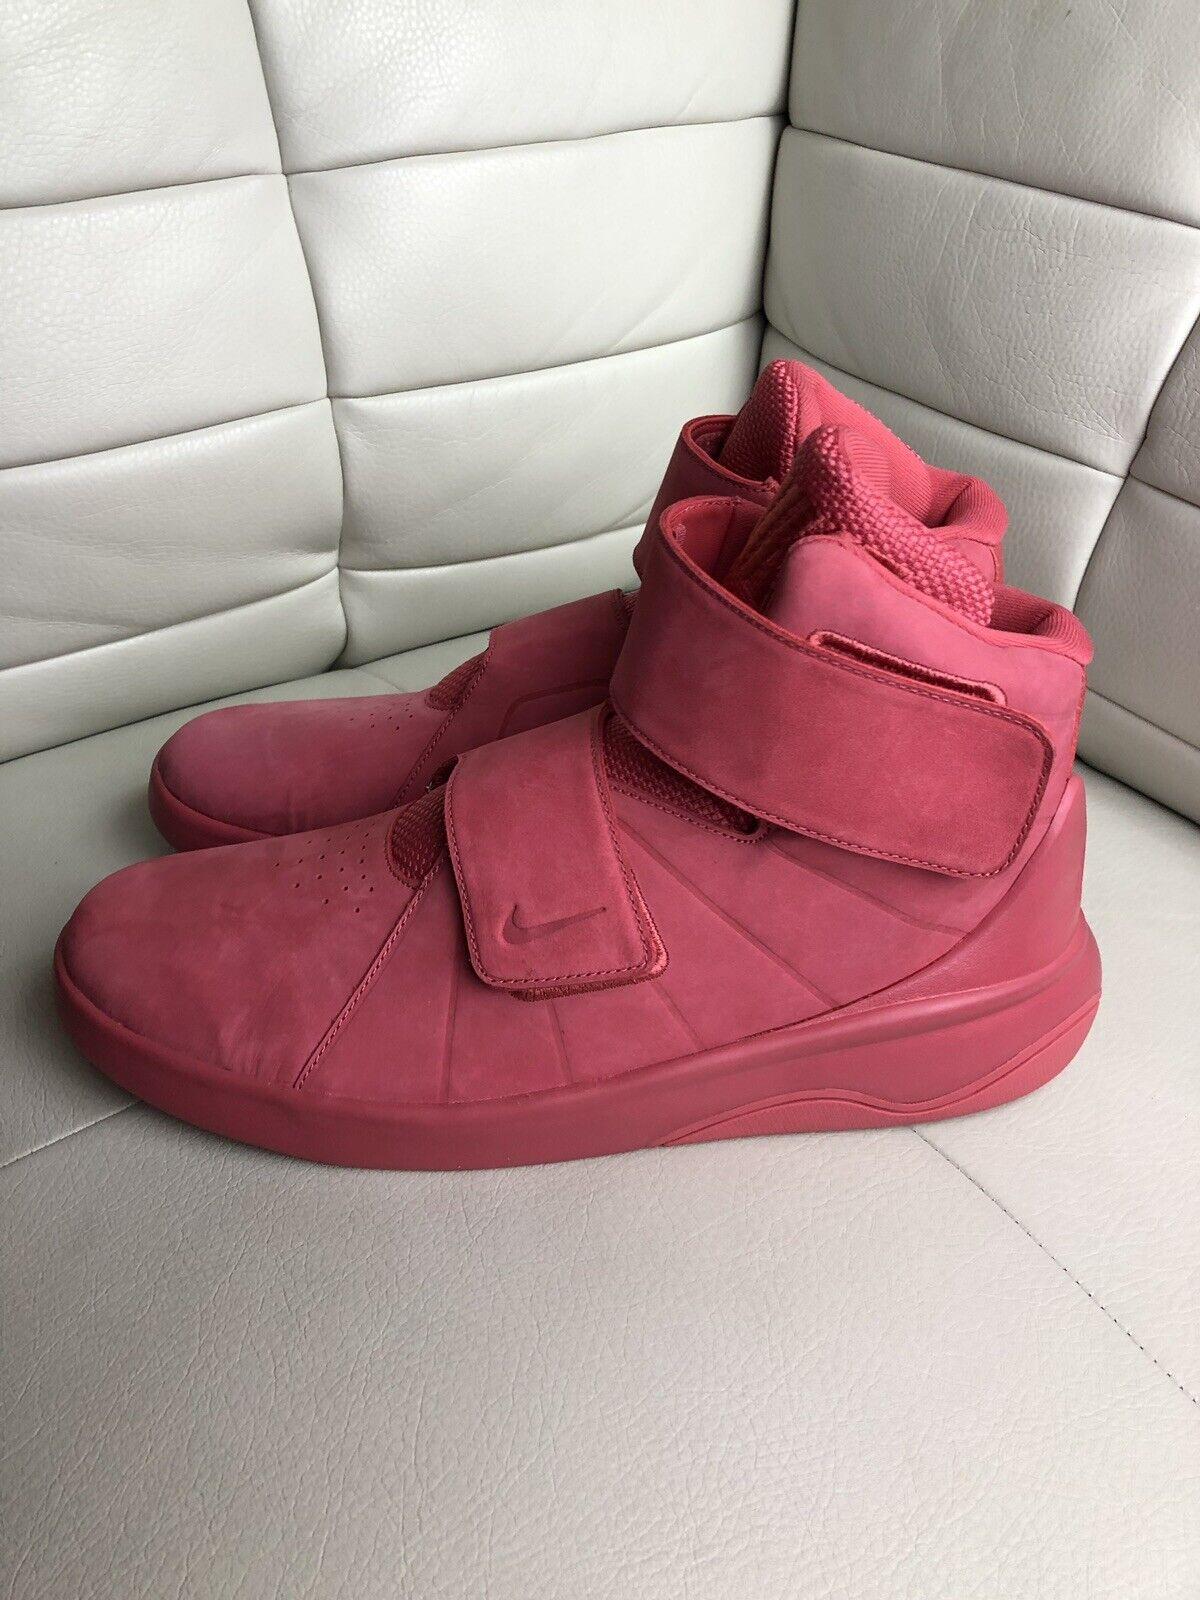 Nike Marxman Premium Terra Red Size 11.5